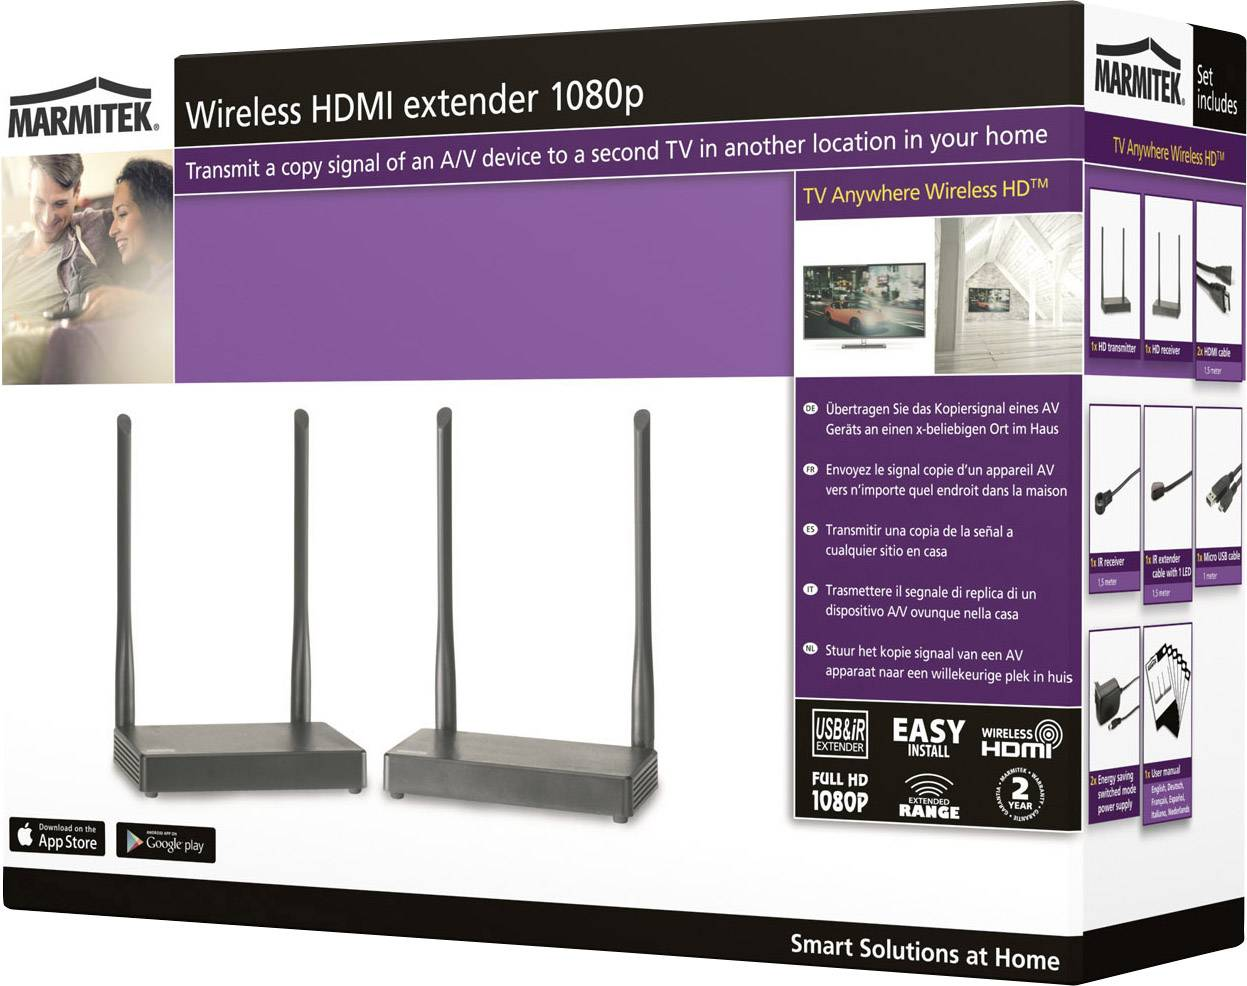 Marmitek TV Anywhere Wireless HD HDMI naprava za brezžični prenos (komplet) 200 m  1920 x 1080 piksel